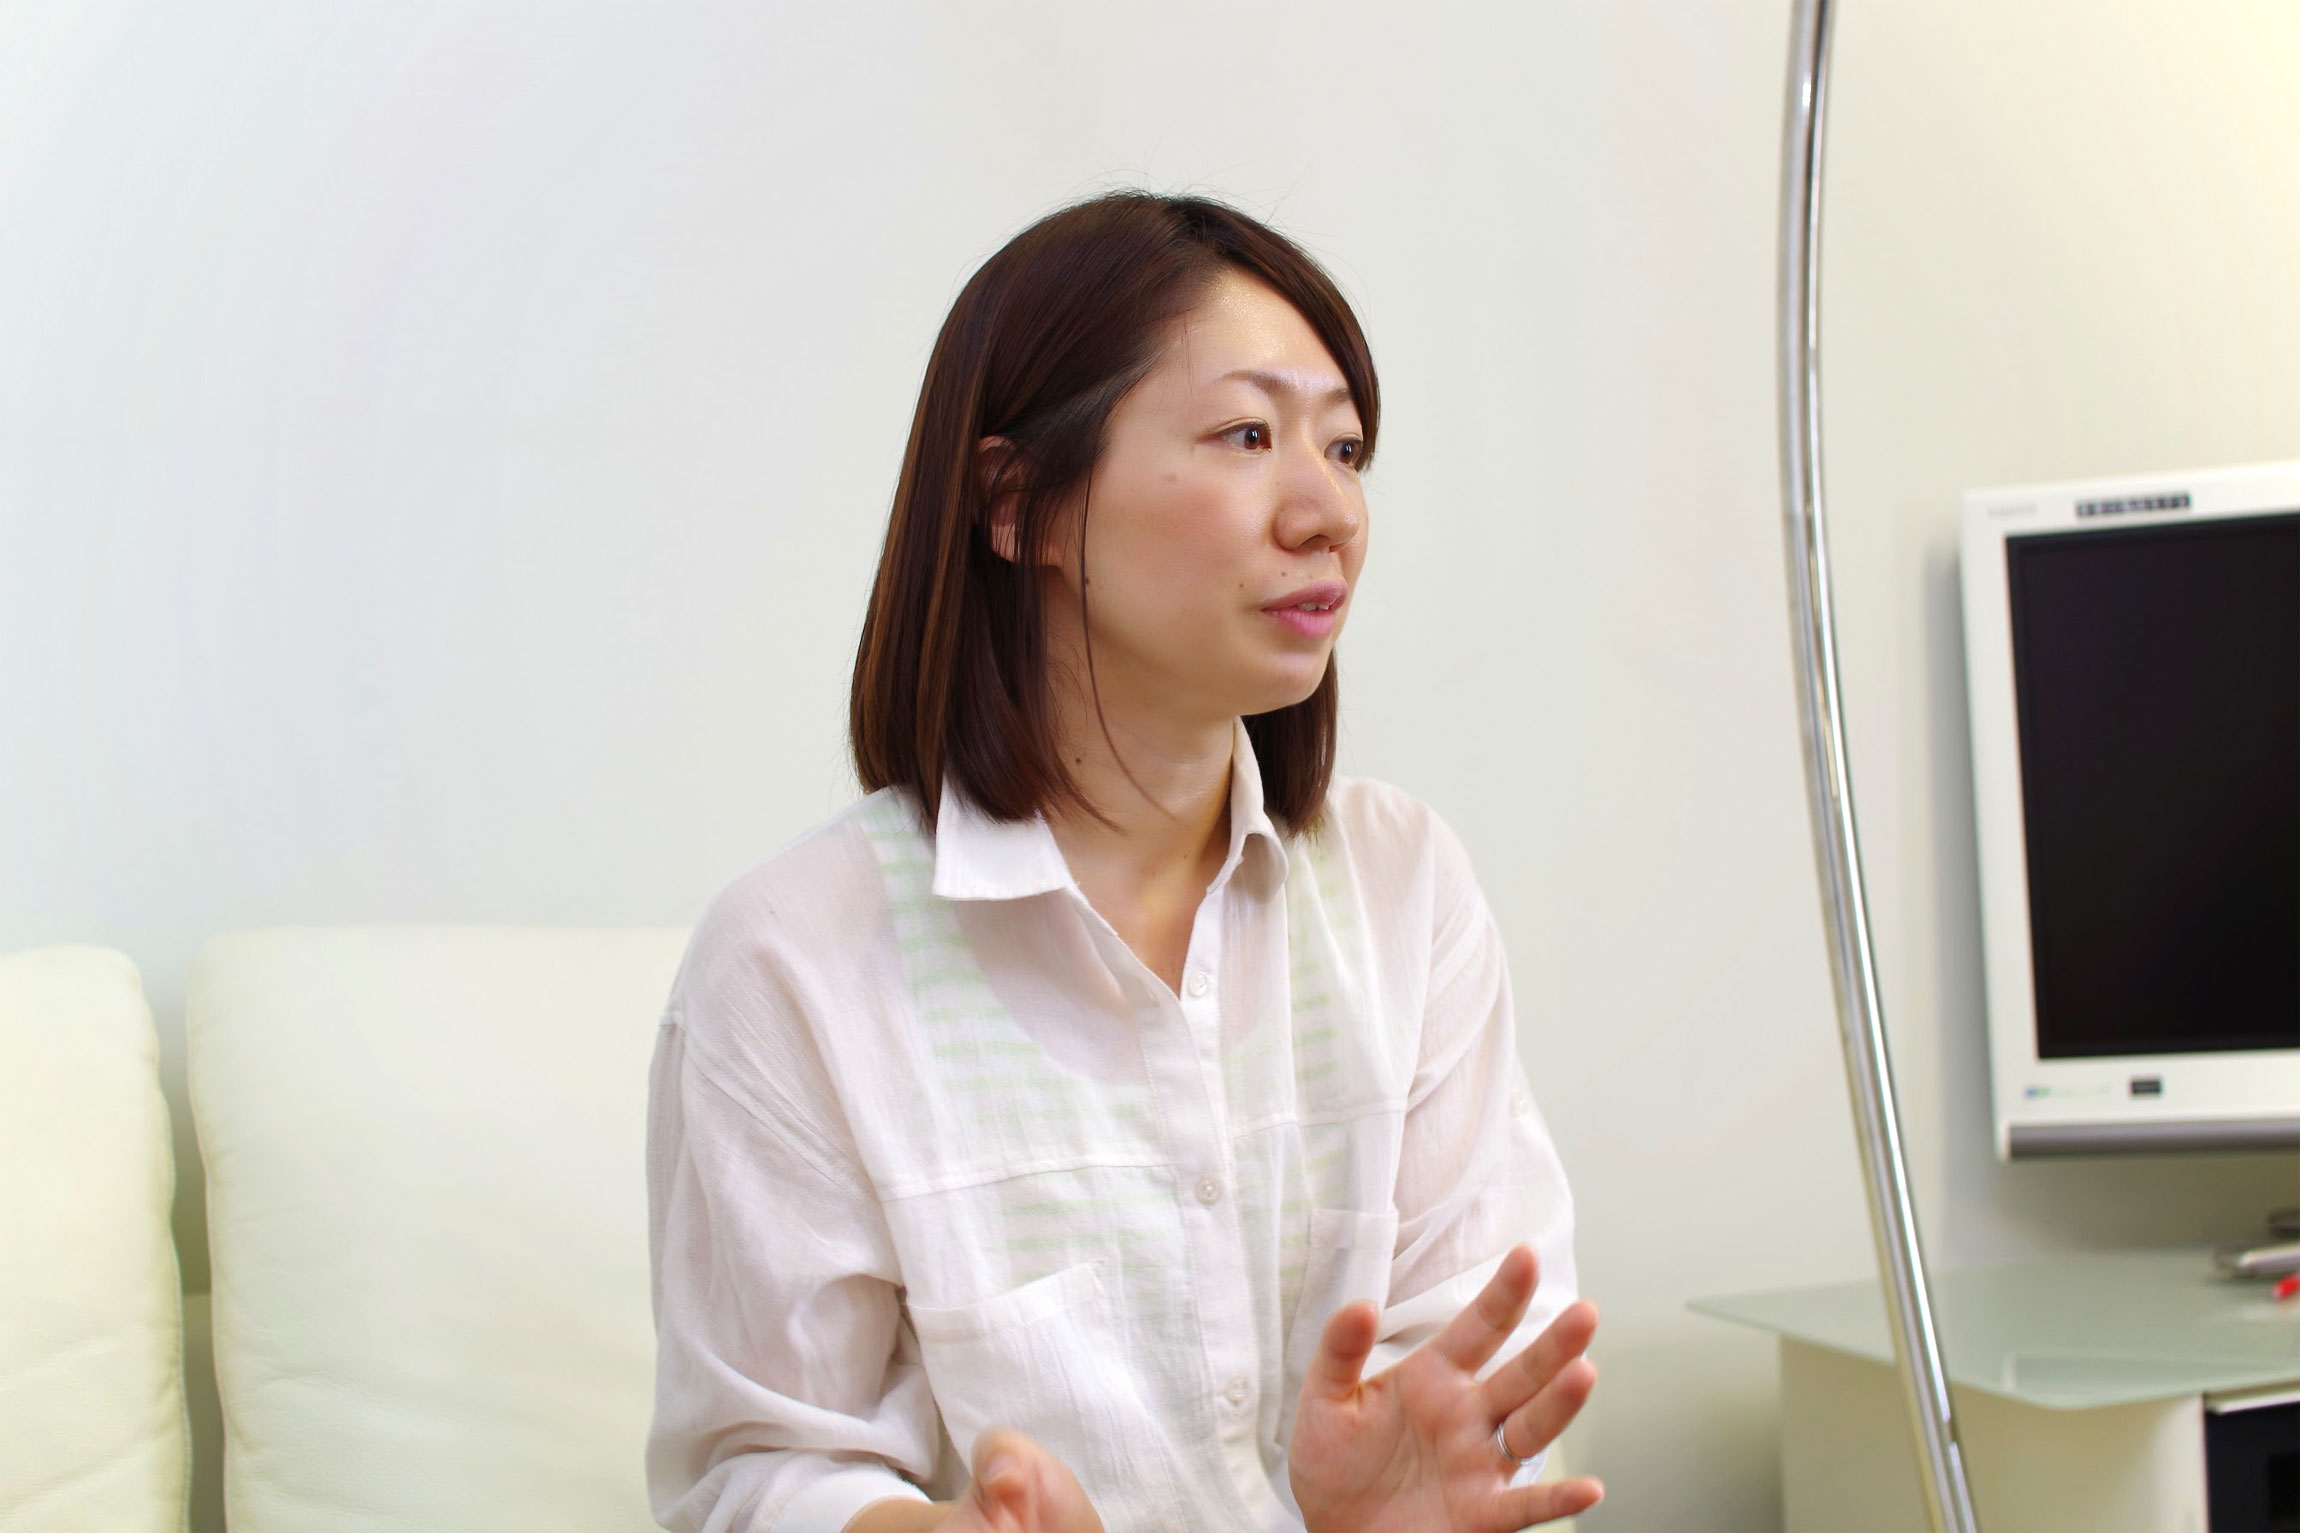 IDCフロンティア ビジネス開発本部の安食千恵さん